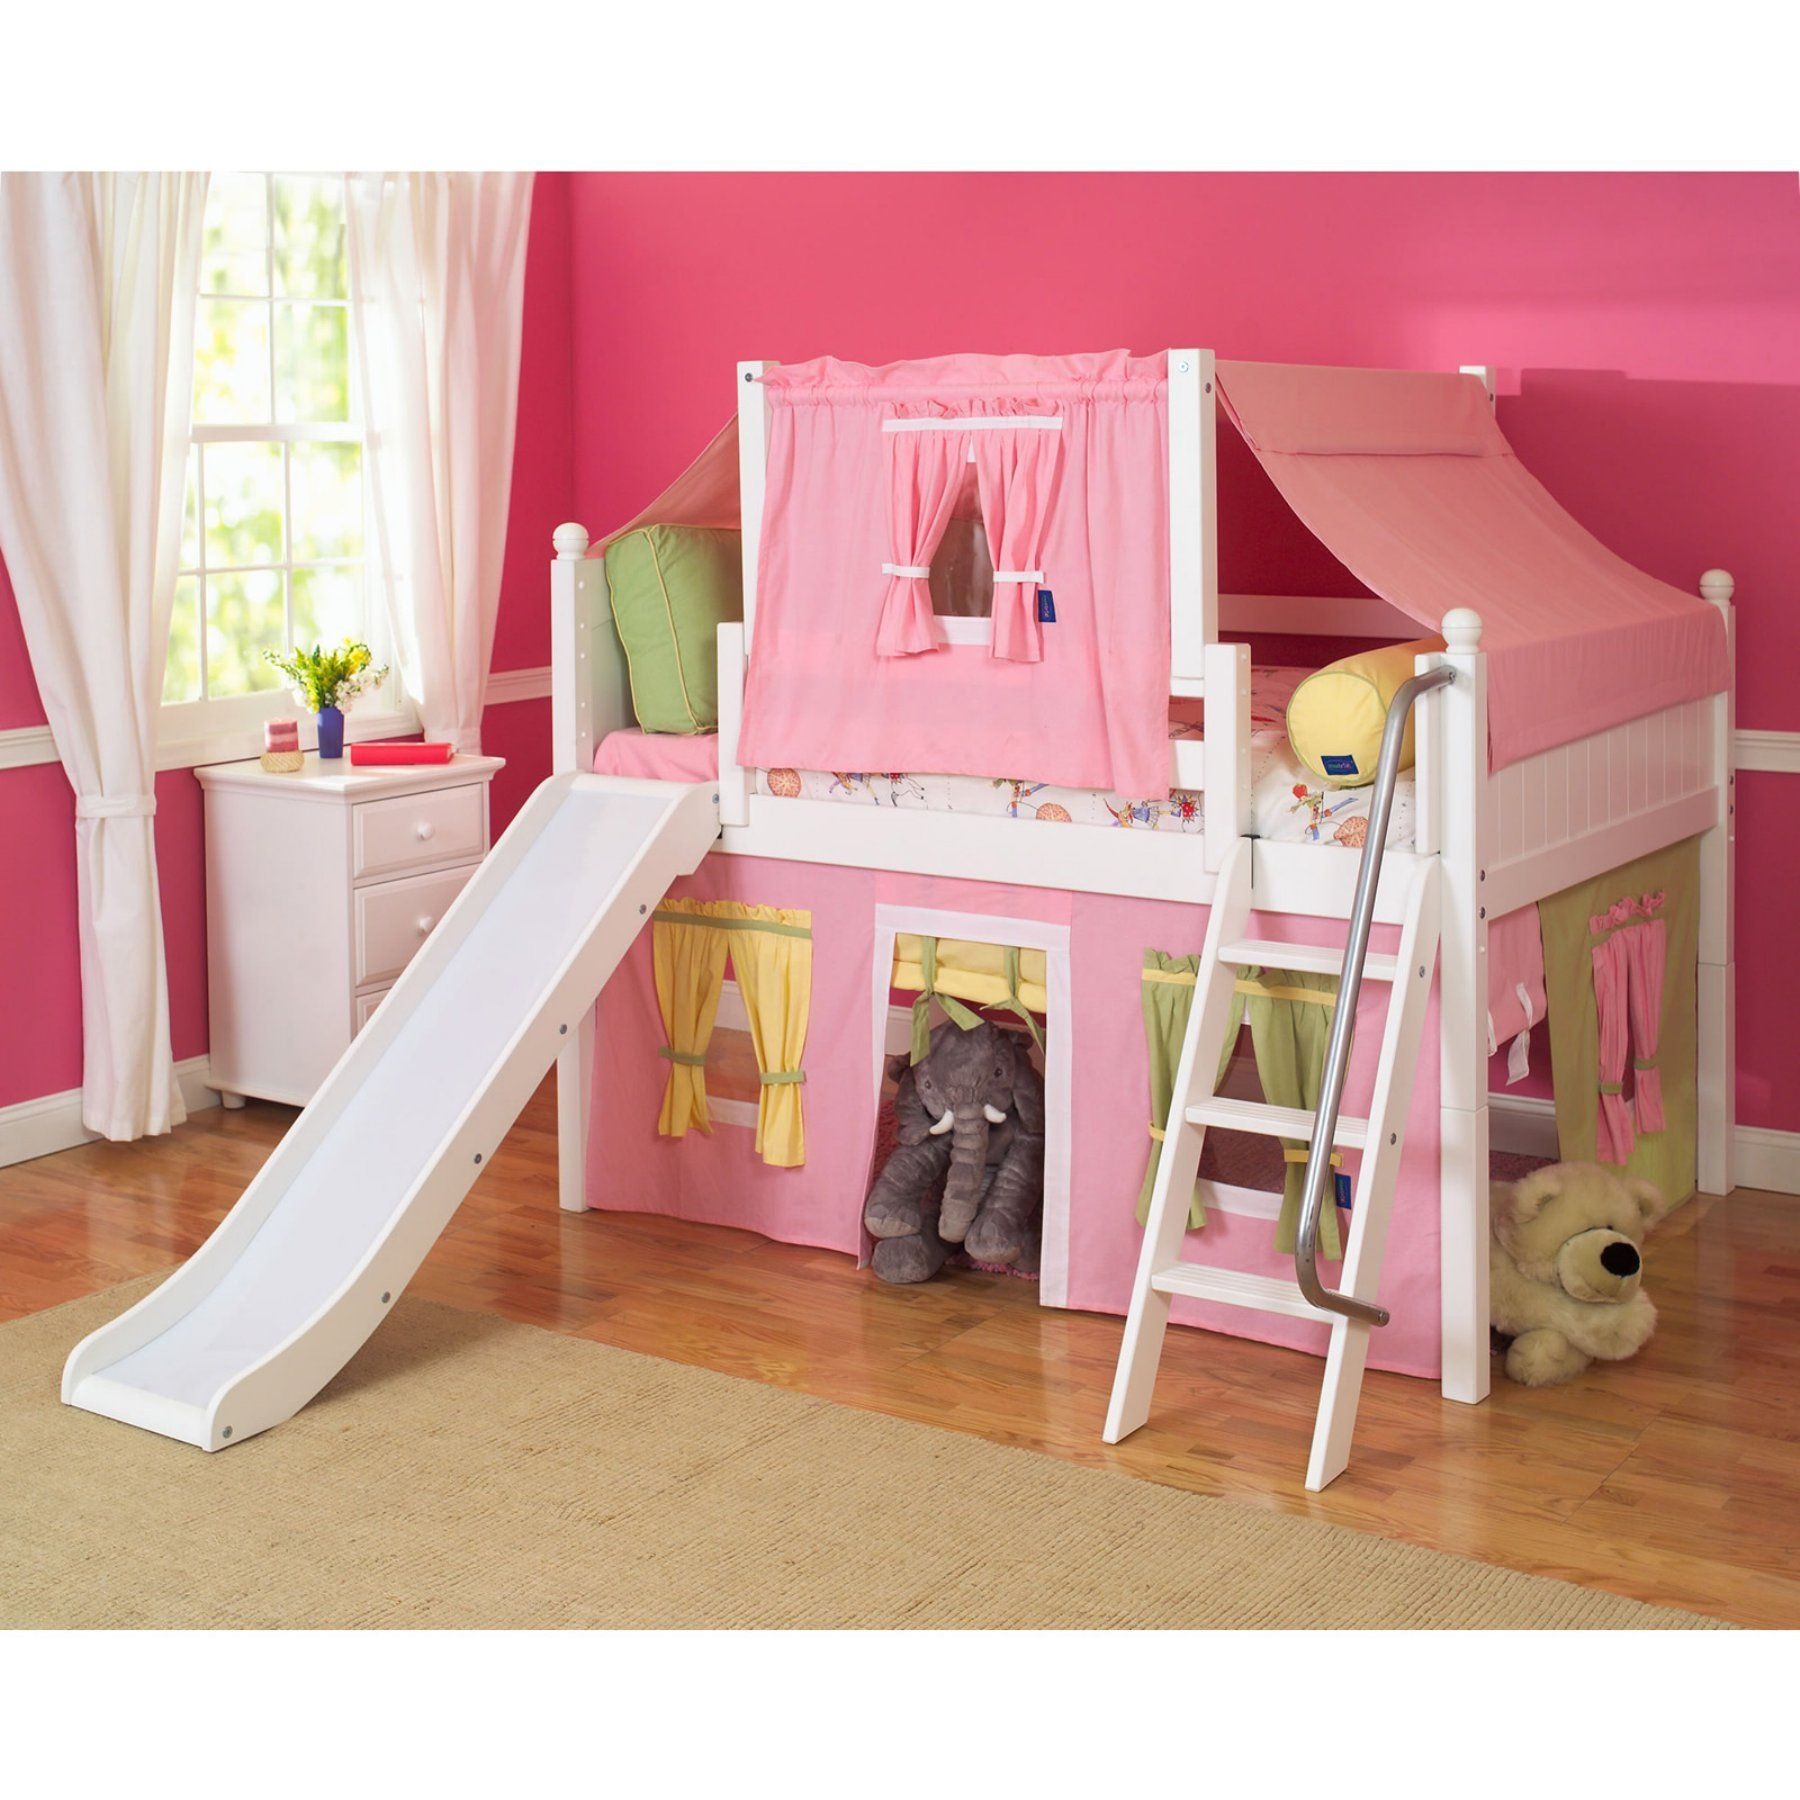 Wow Girl II Deluxe Panel Low Loft Tent Bed with Slide  MXTX